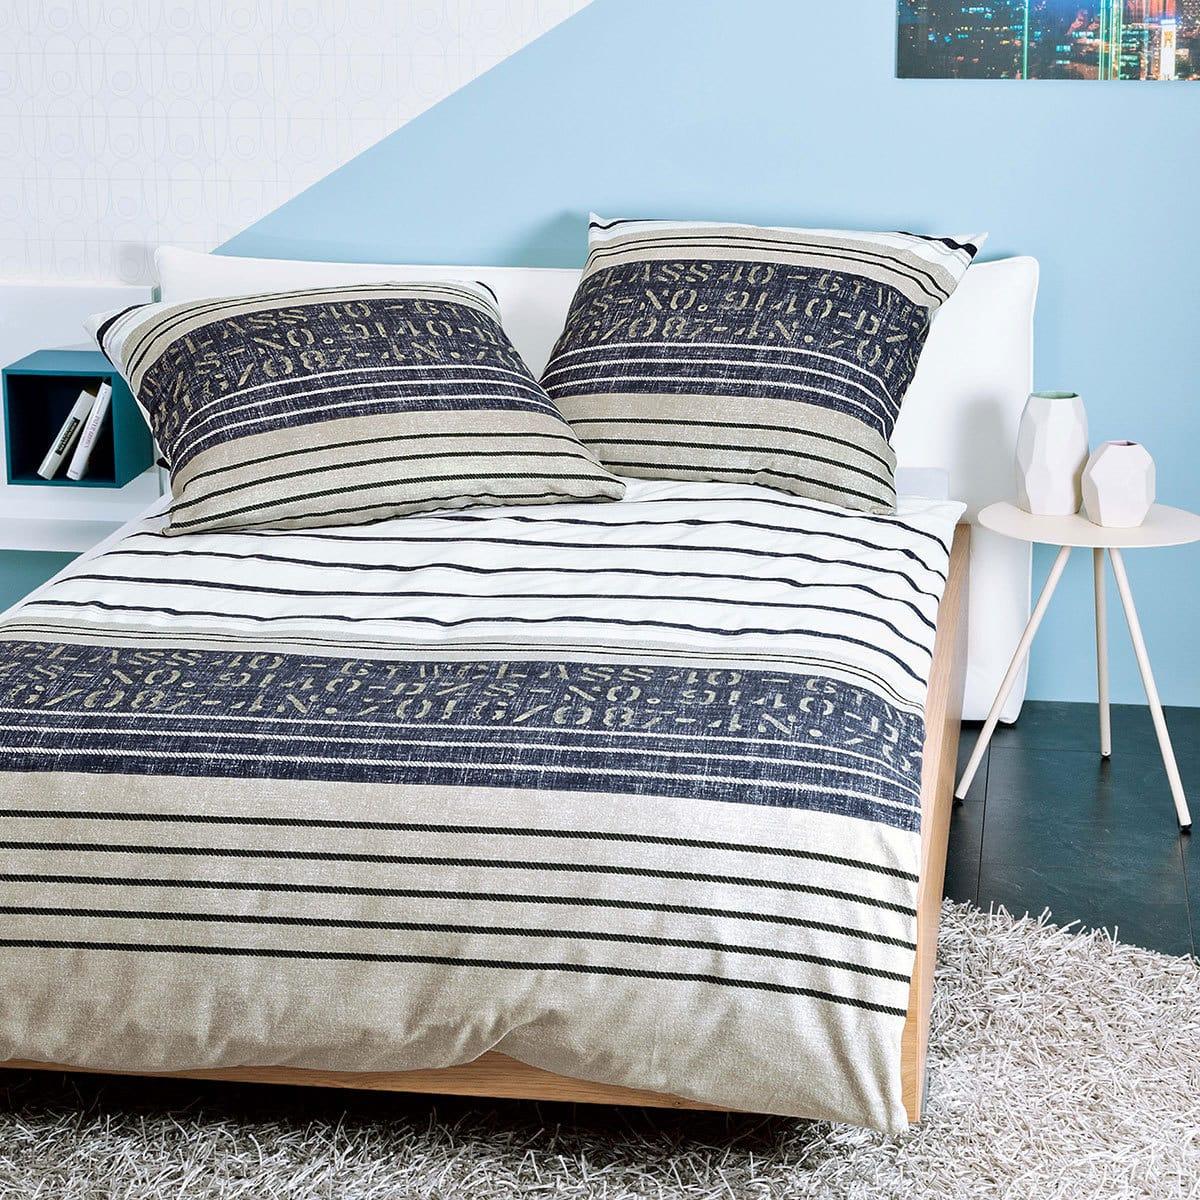 janine feinbiber bettw sche davos 65013 07 g nstig online. Black Bedroom Furniture Sets. Home Design Ideas